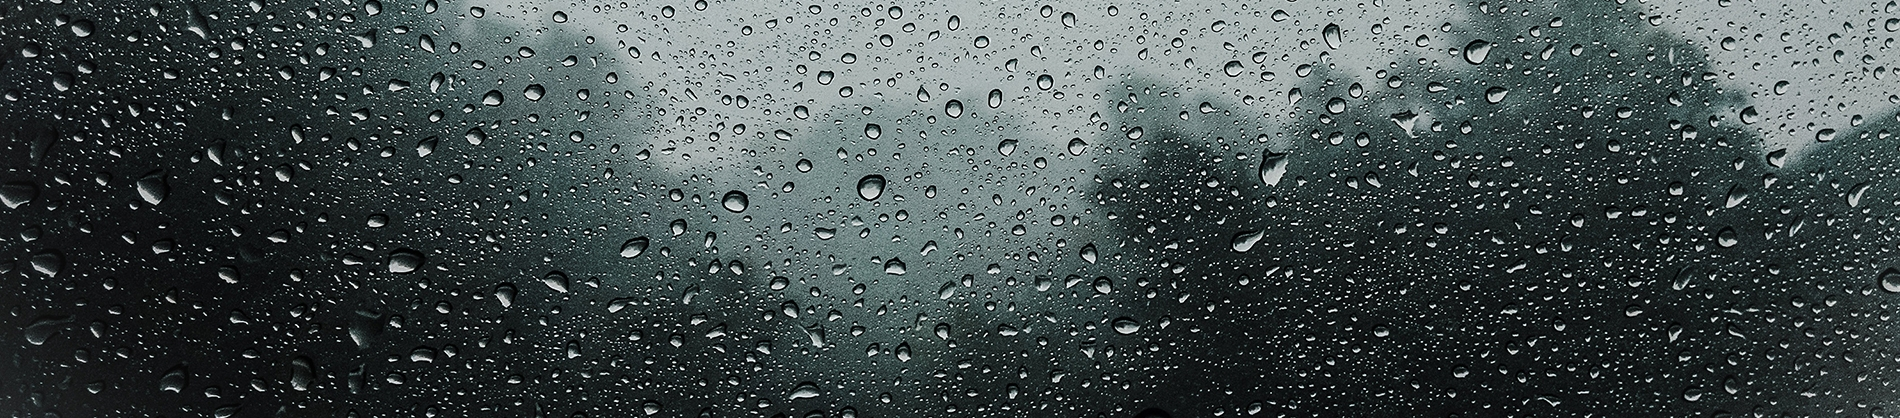 A window with rain drops on it